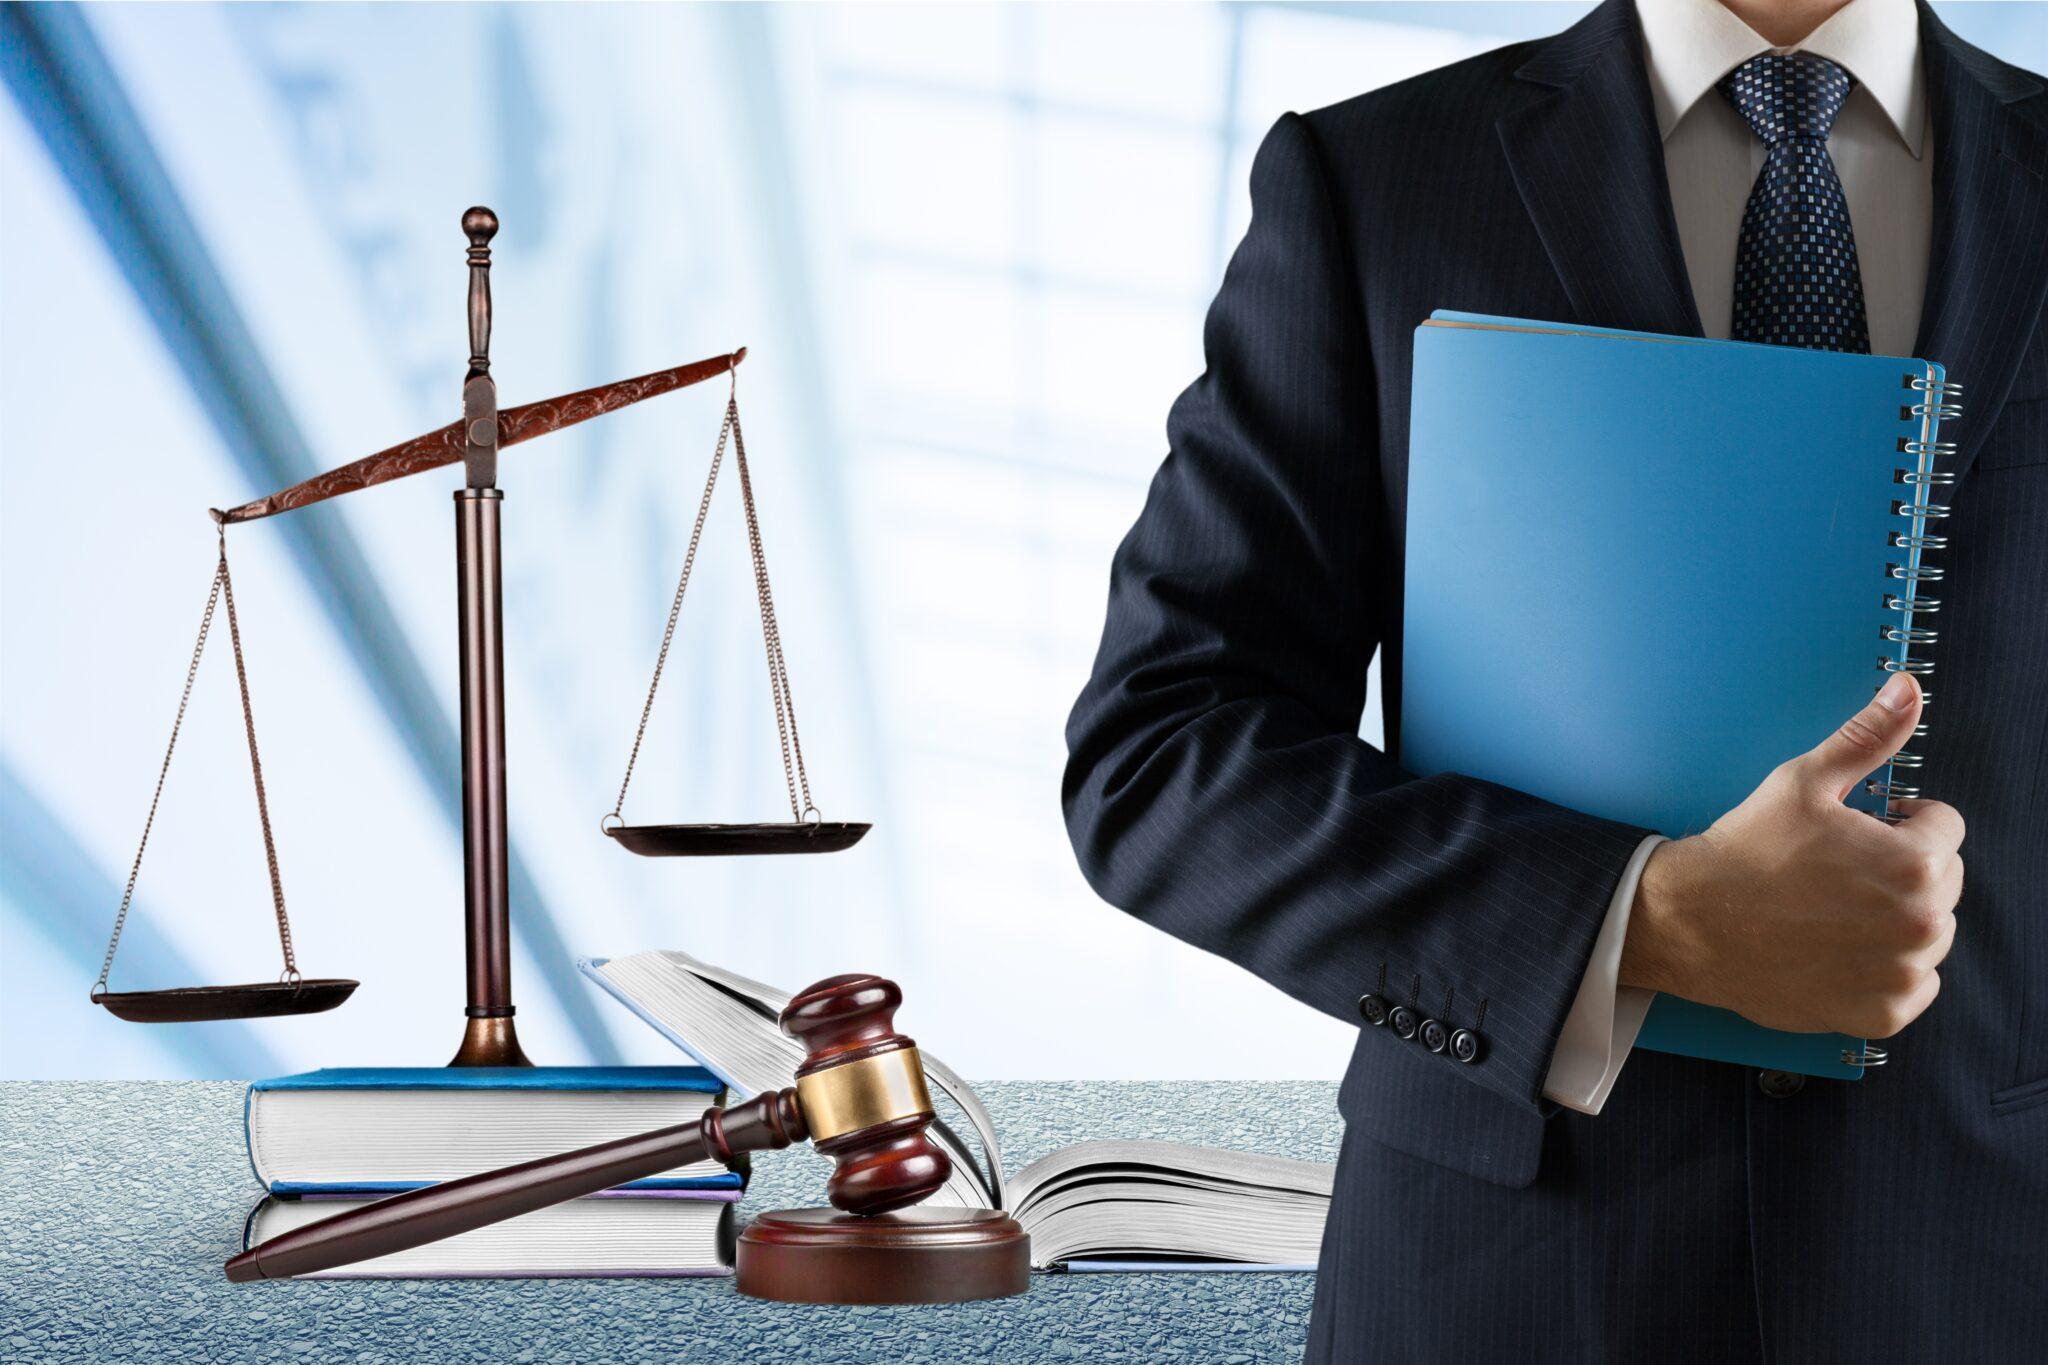 таможенный юрист консультация